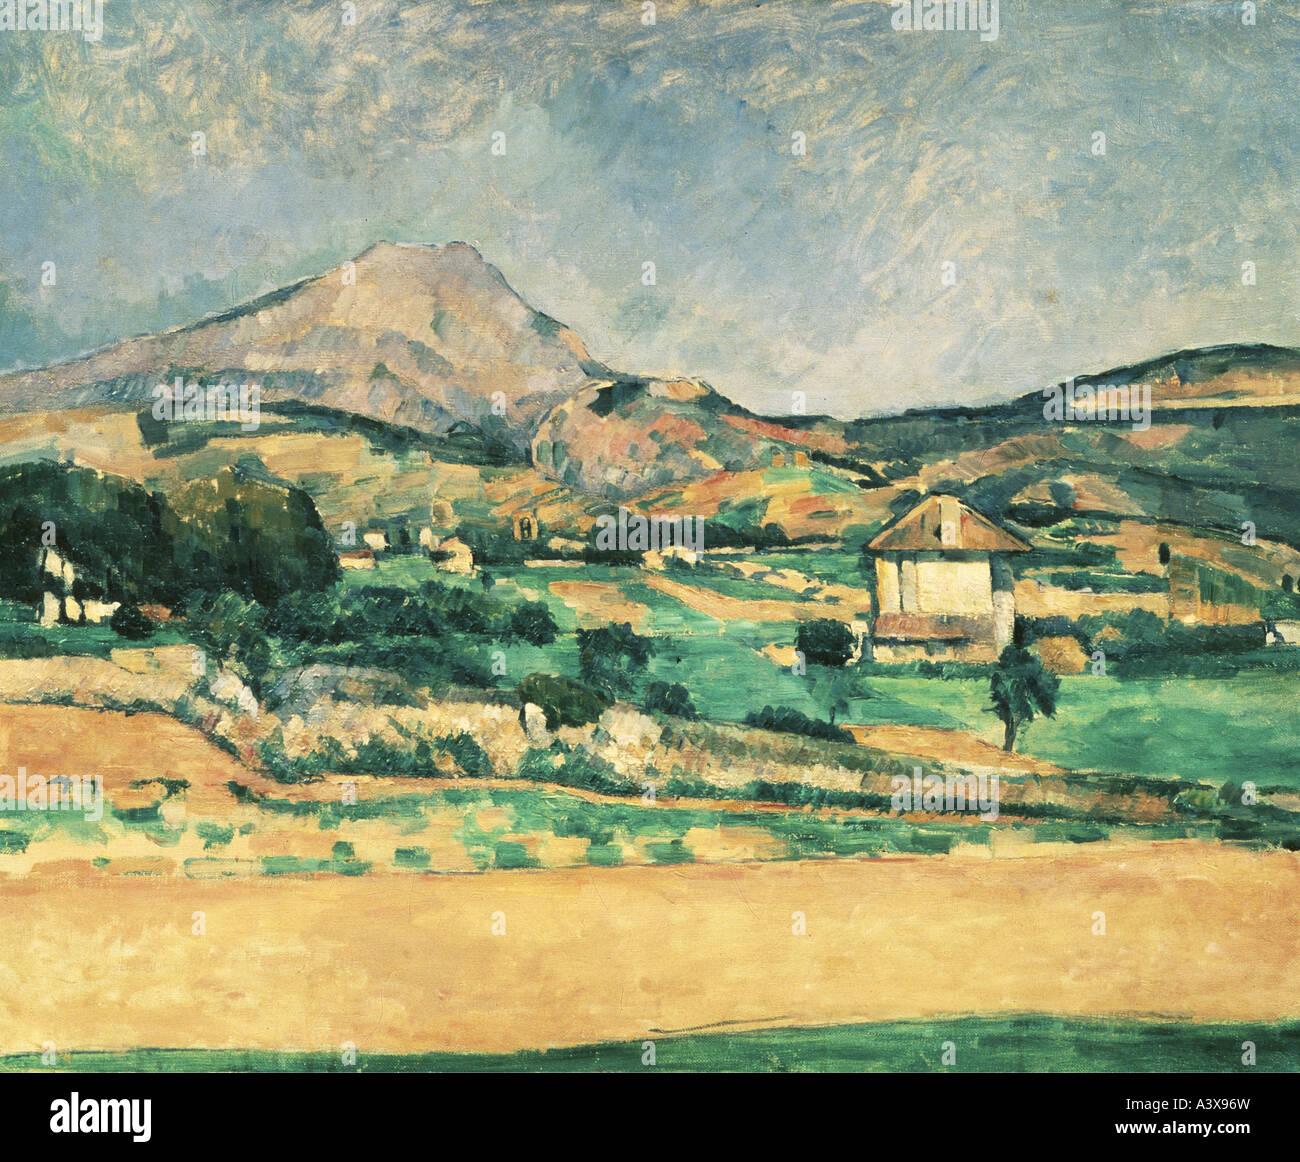 """Fine Arts, Cezanne, Paul, (1839-1906), Malerei,"" La Montagne Sainte-Victoire "", (""Blick auf Mont Sainte-Victoire""), Stockfoto"